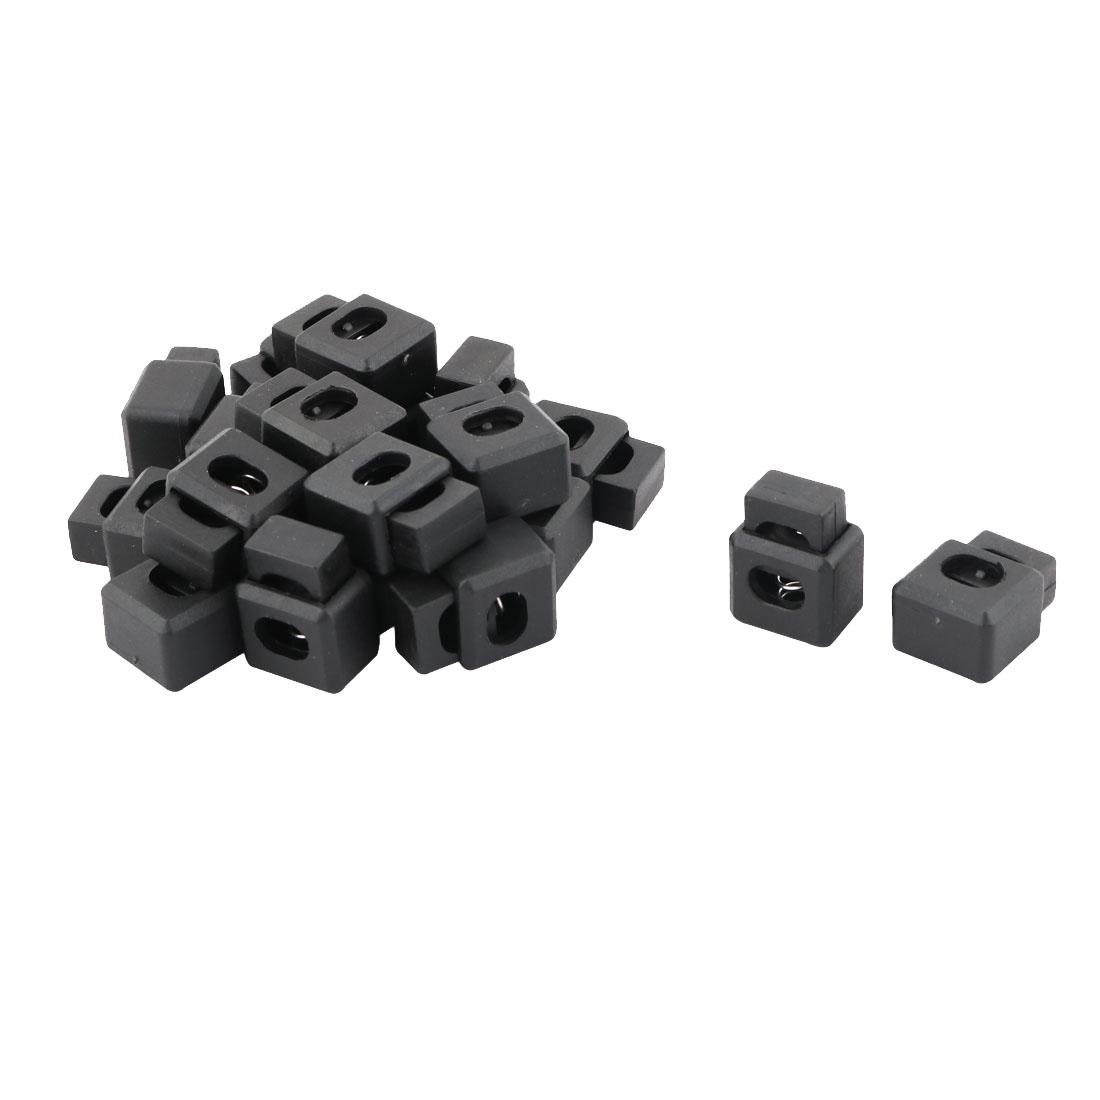 Plastic Square Single Hole Toggle Stopper Cord String Adjustive Lock Fastener Black 20 Pcs